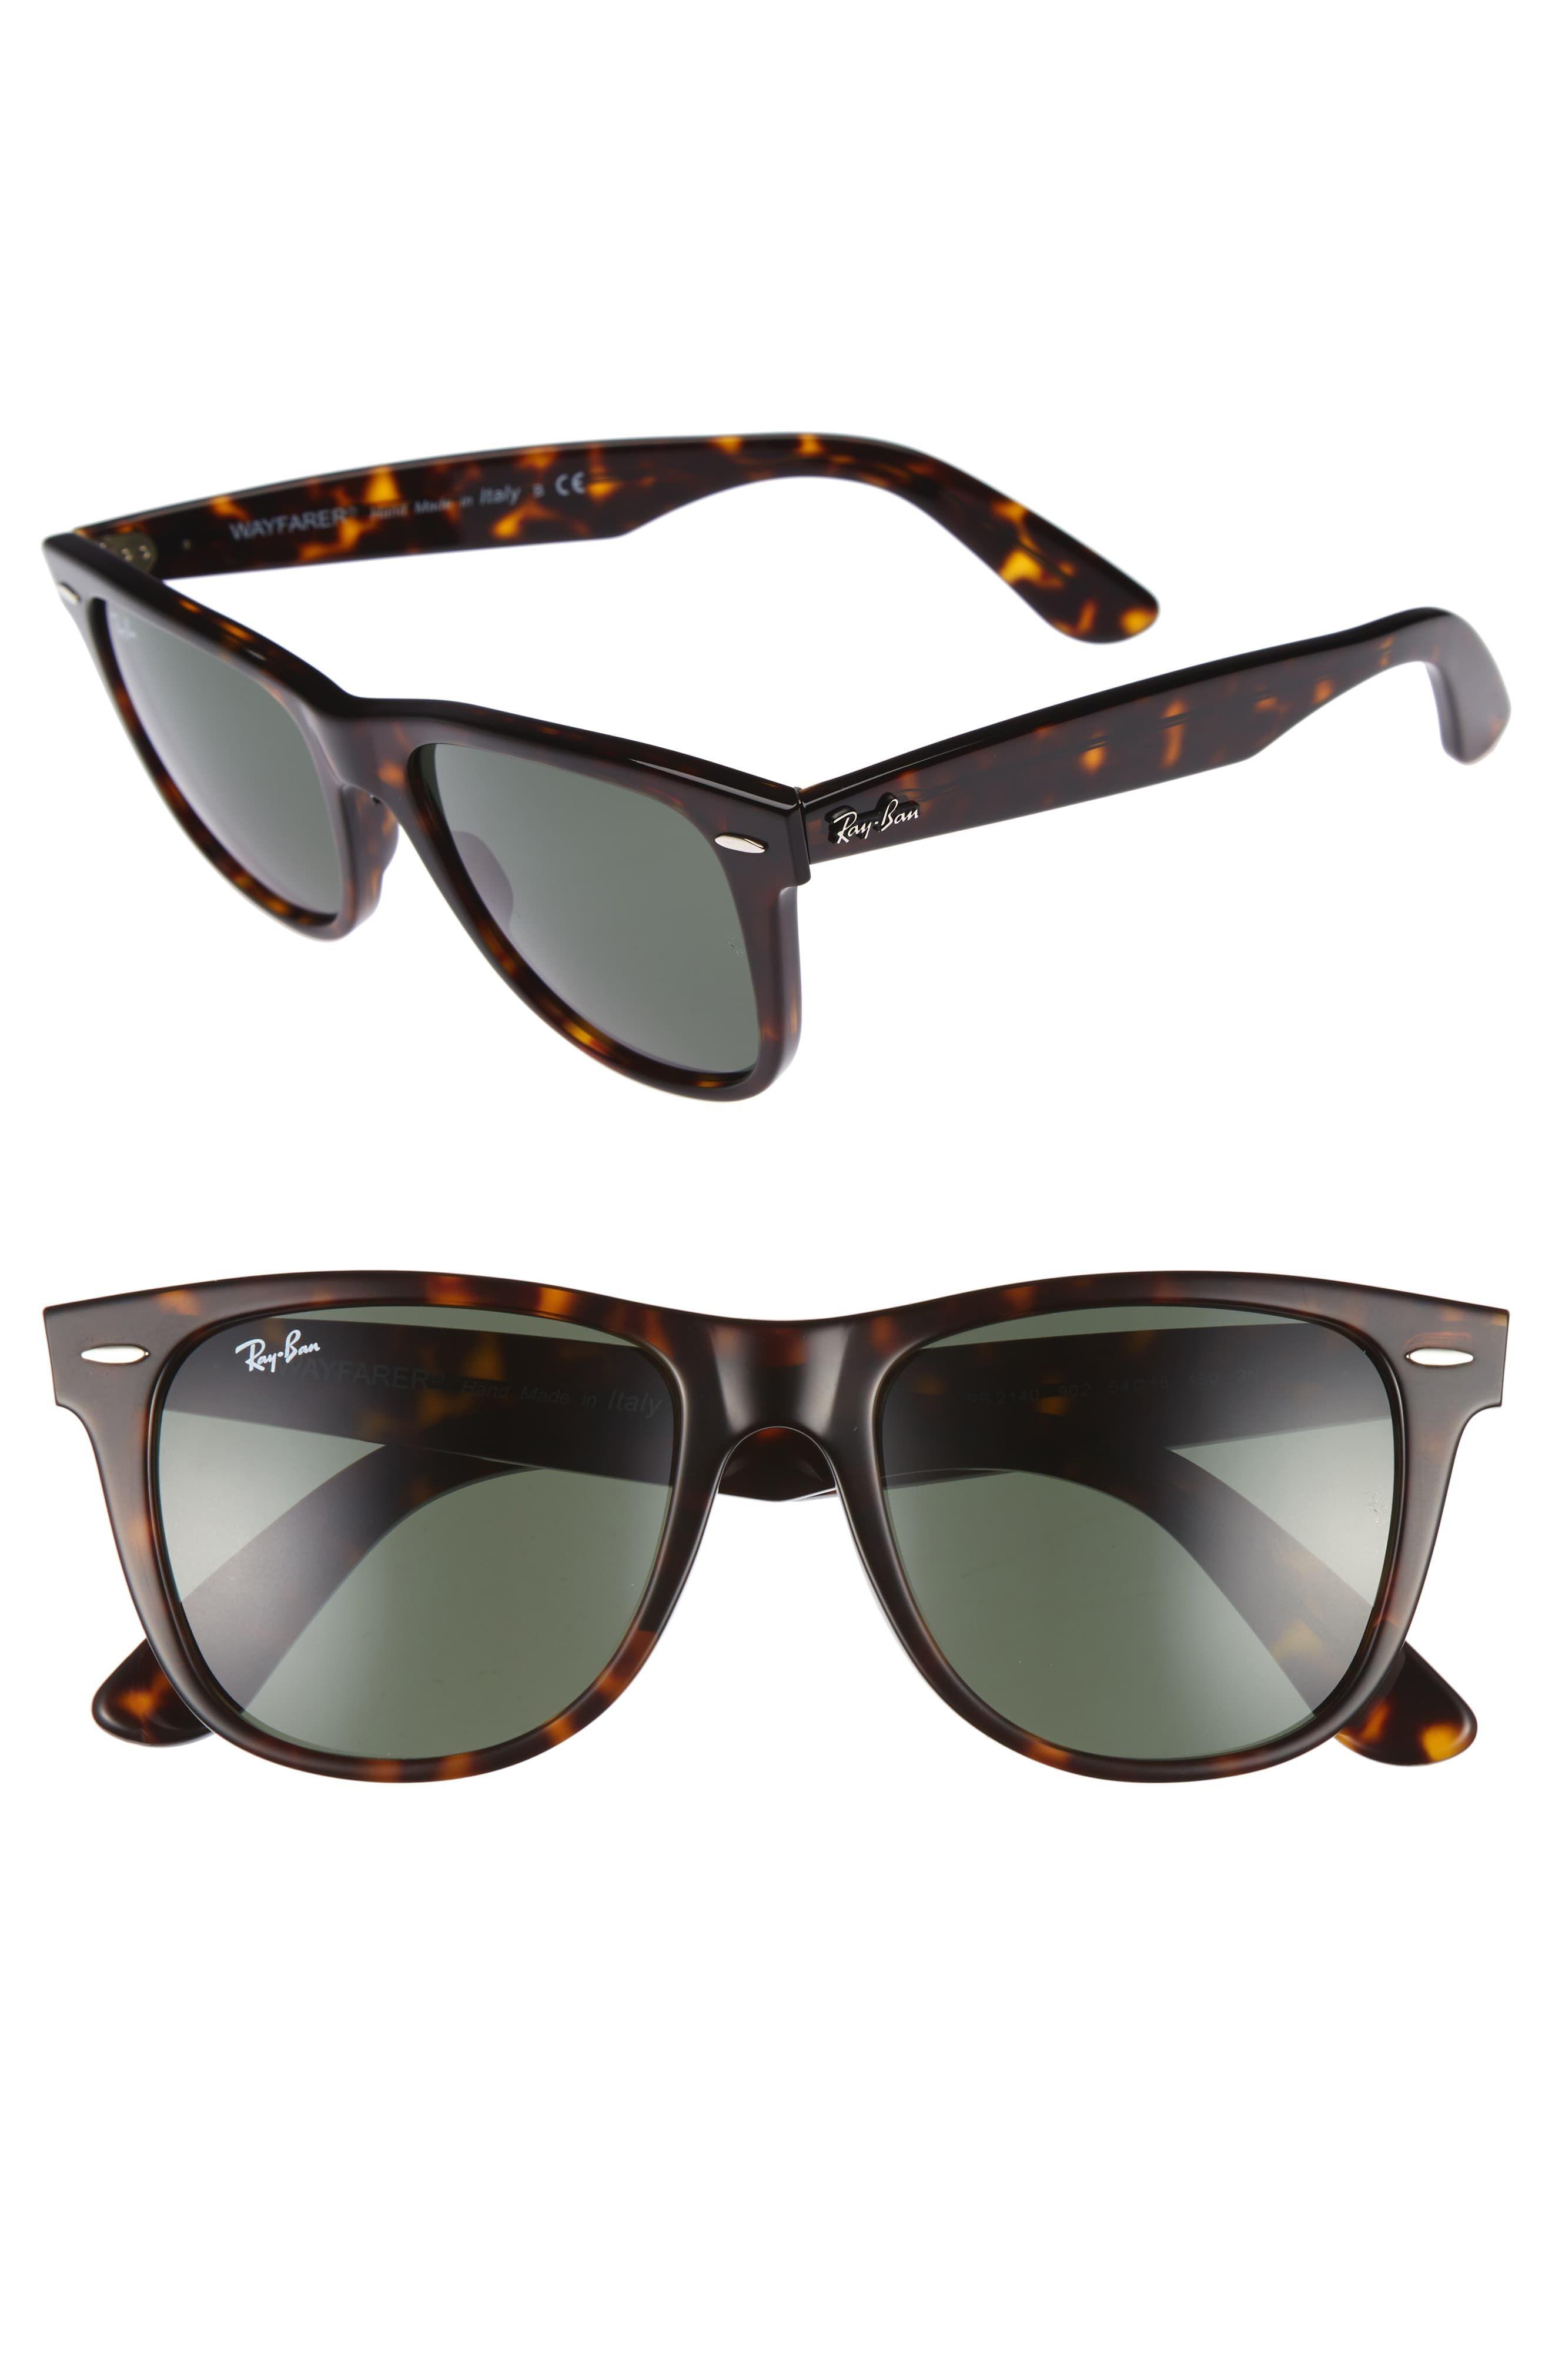 Men S Ray Ban Classic Wayfarer 54mm Sunglasses Dark Tortoise Green Rayban Sunglasses Mens Mens Sunglasses Fishing Sunglasses